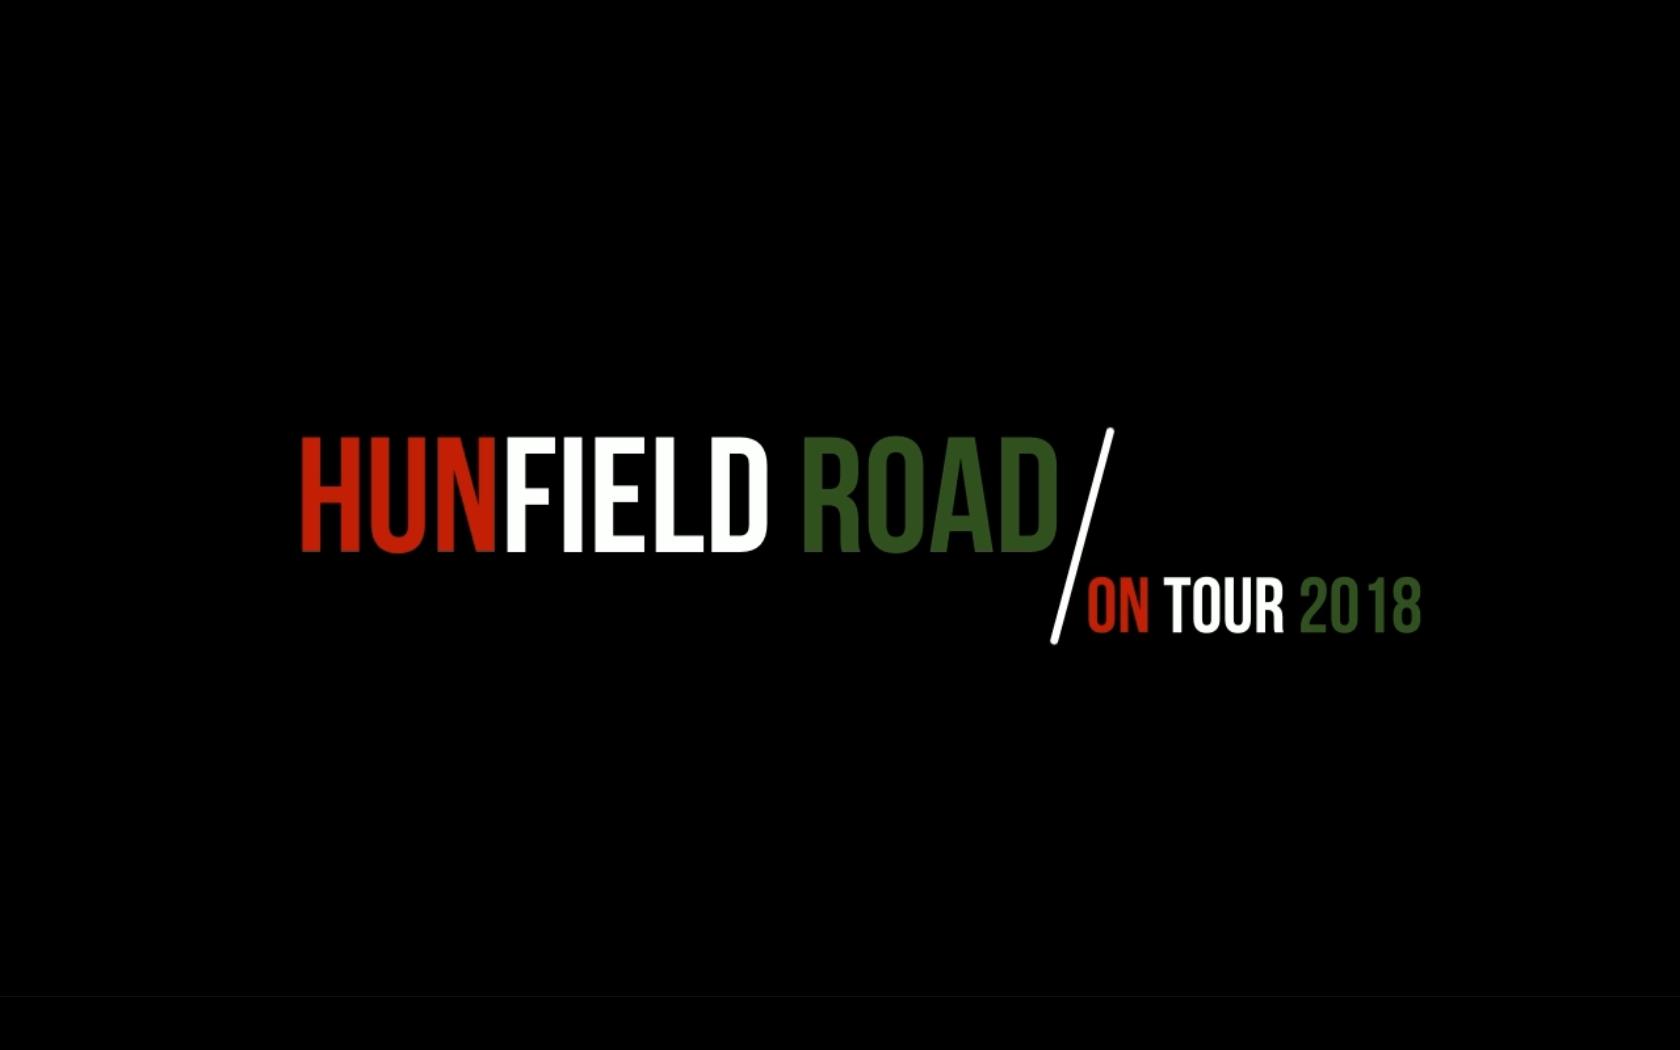 hunfield_road_on_tour_2018.jpg